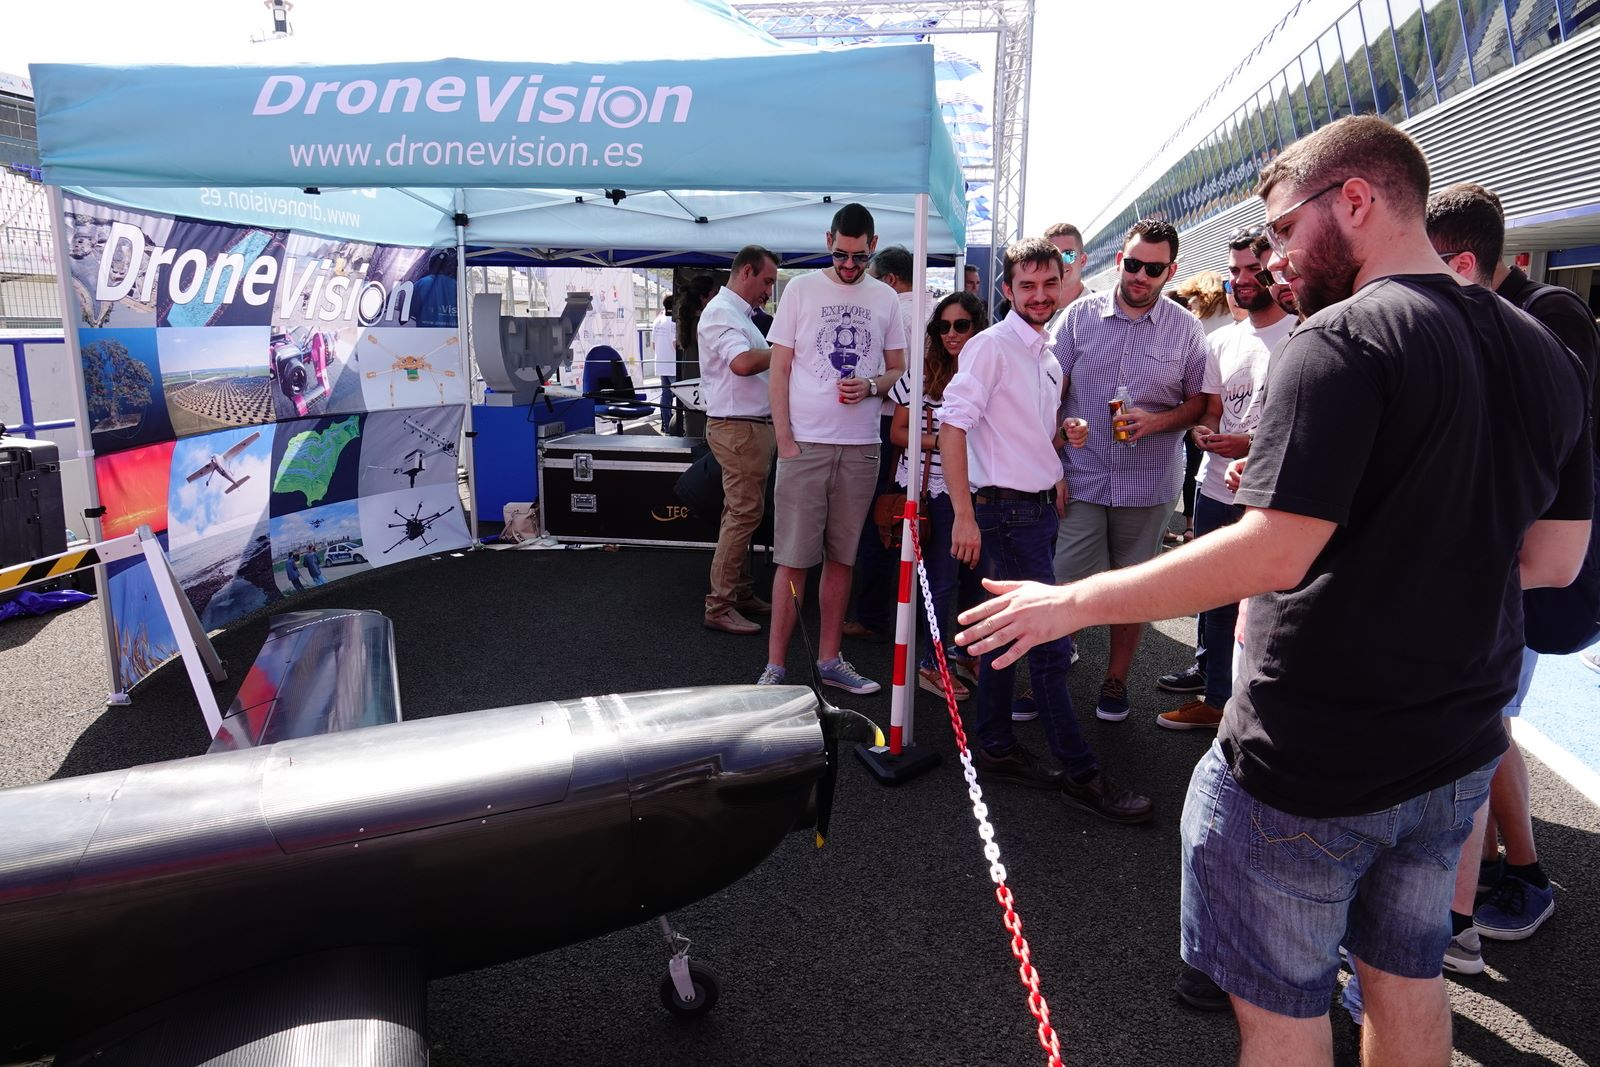 ejemplo de dron | Dronevision